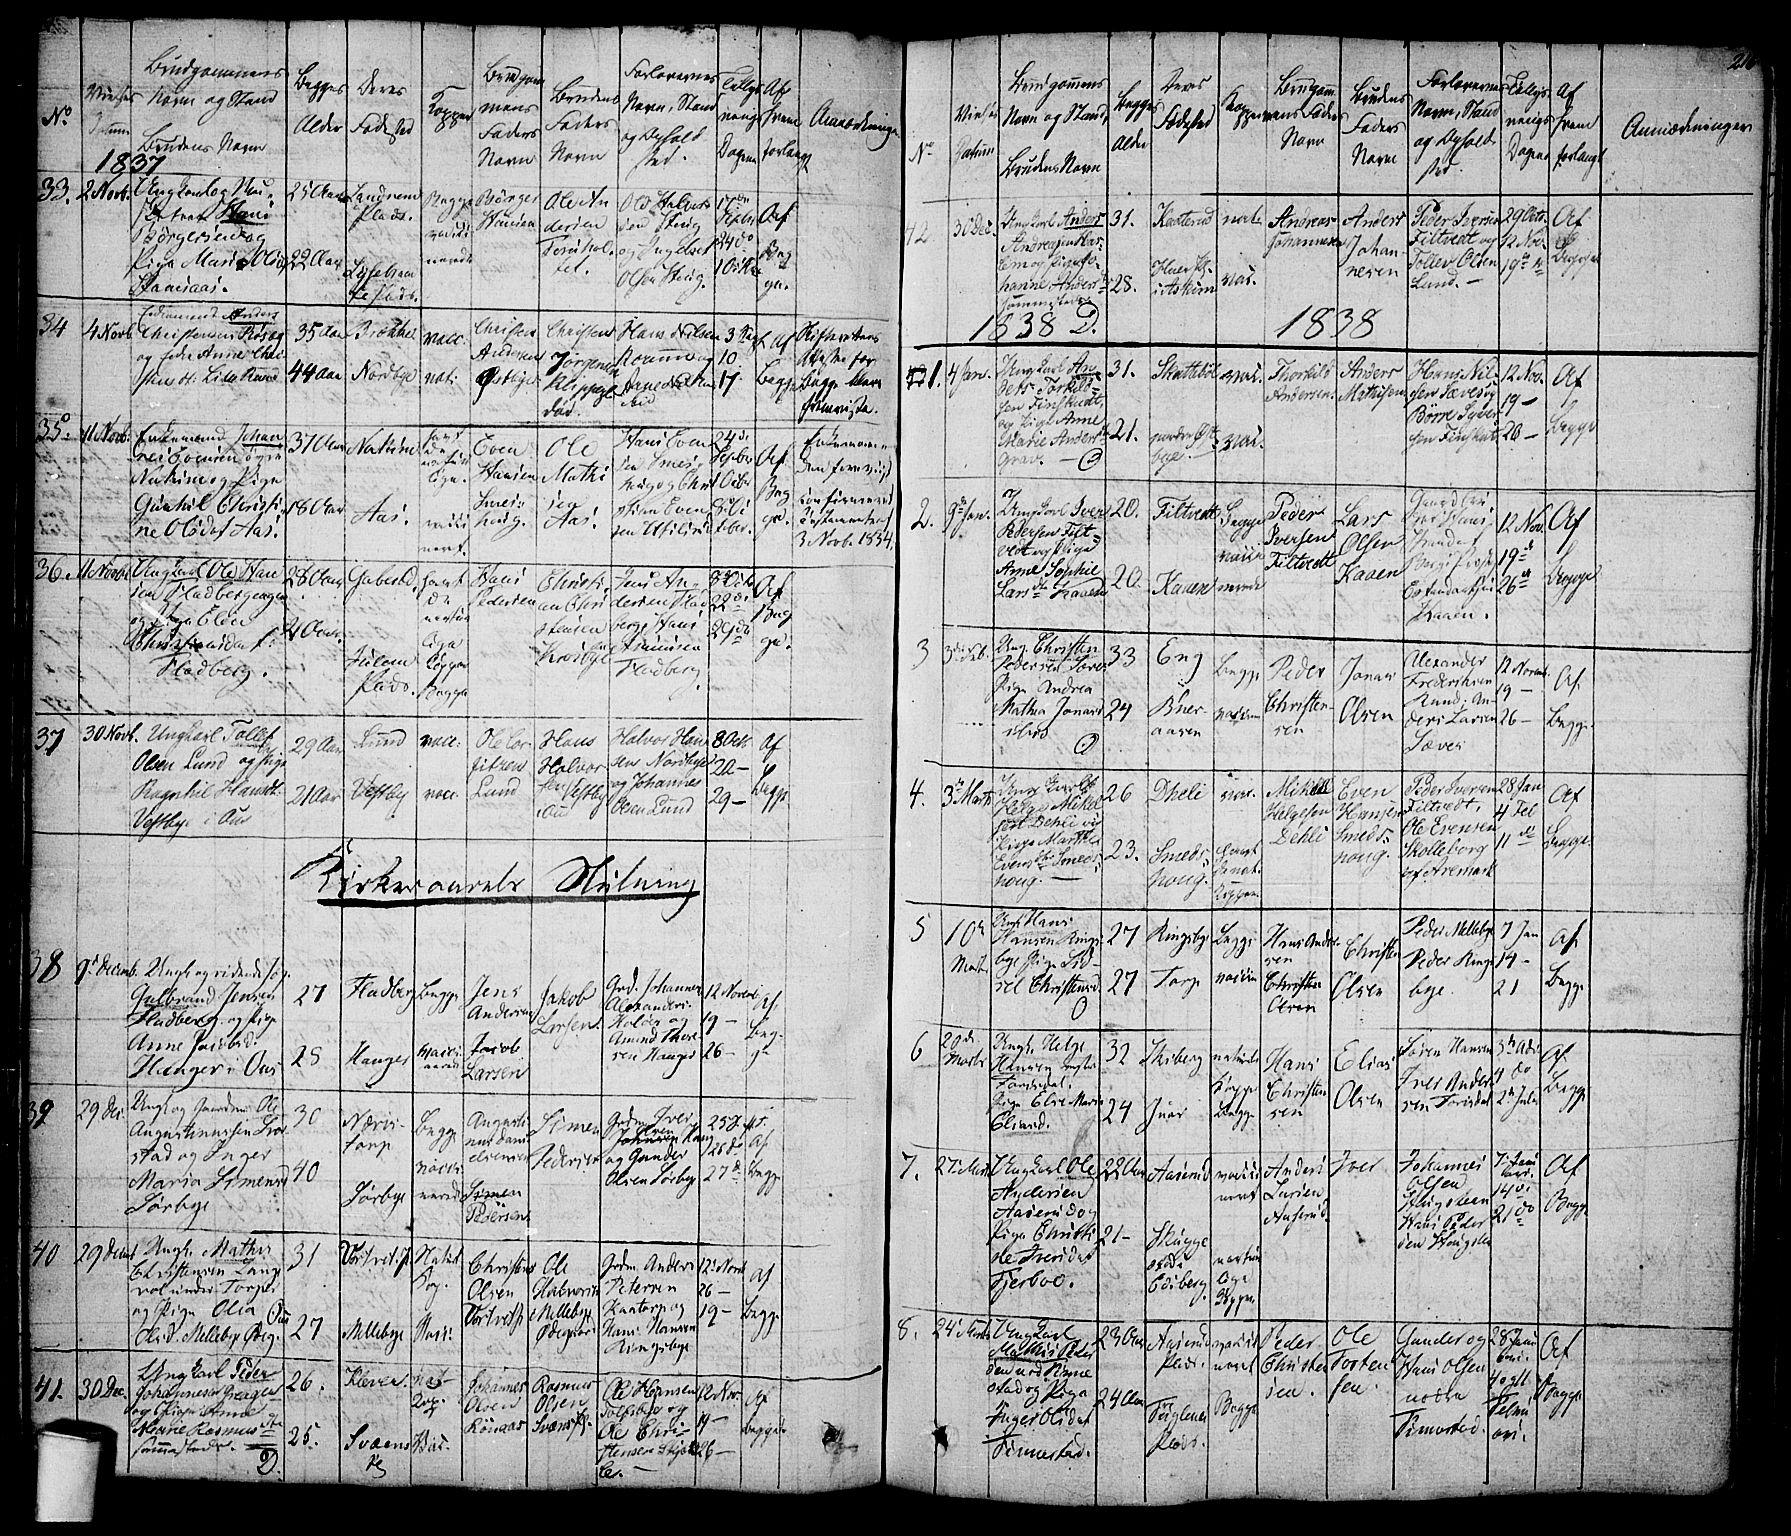 SAO, Rakkestad prestekontor Kirkebøker, F/Fa/L0007: Ministerialbok nr. I 7, 1825-1841, s. 216